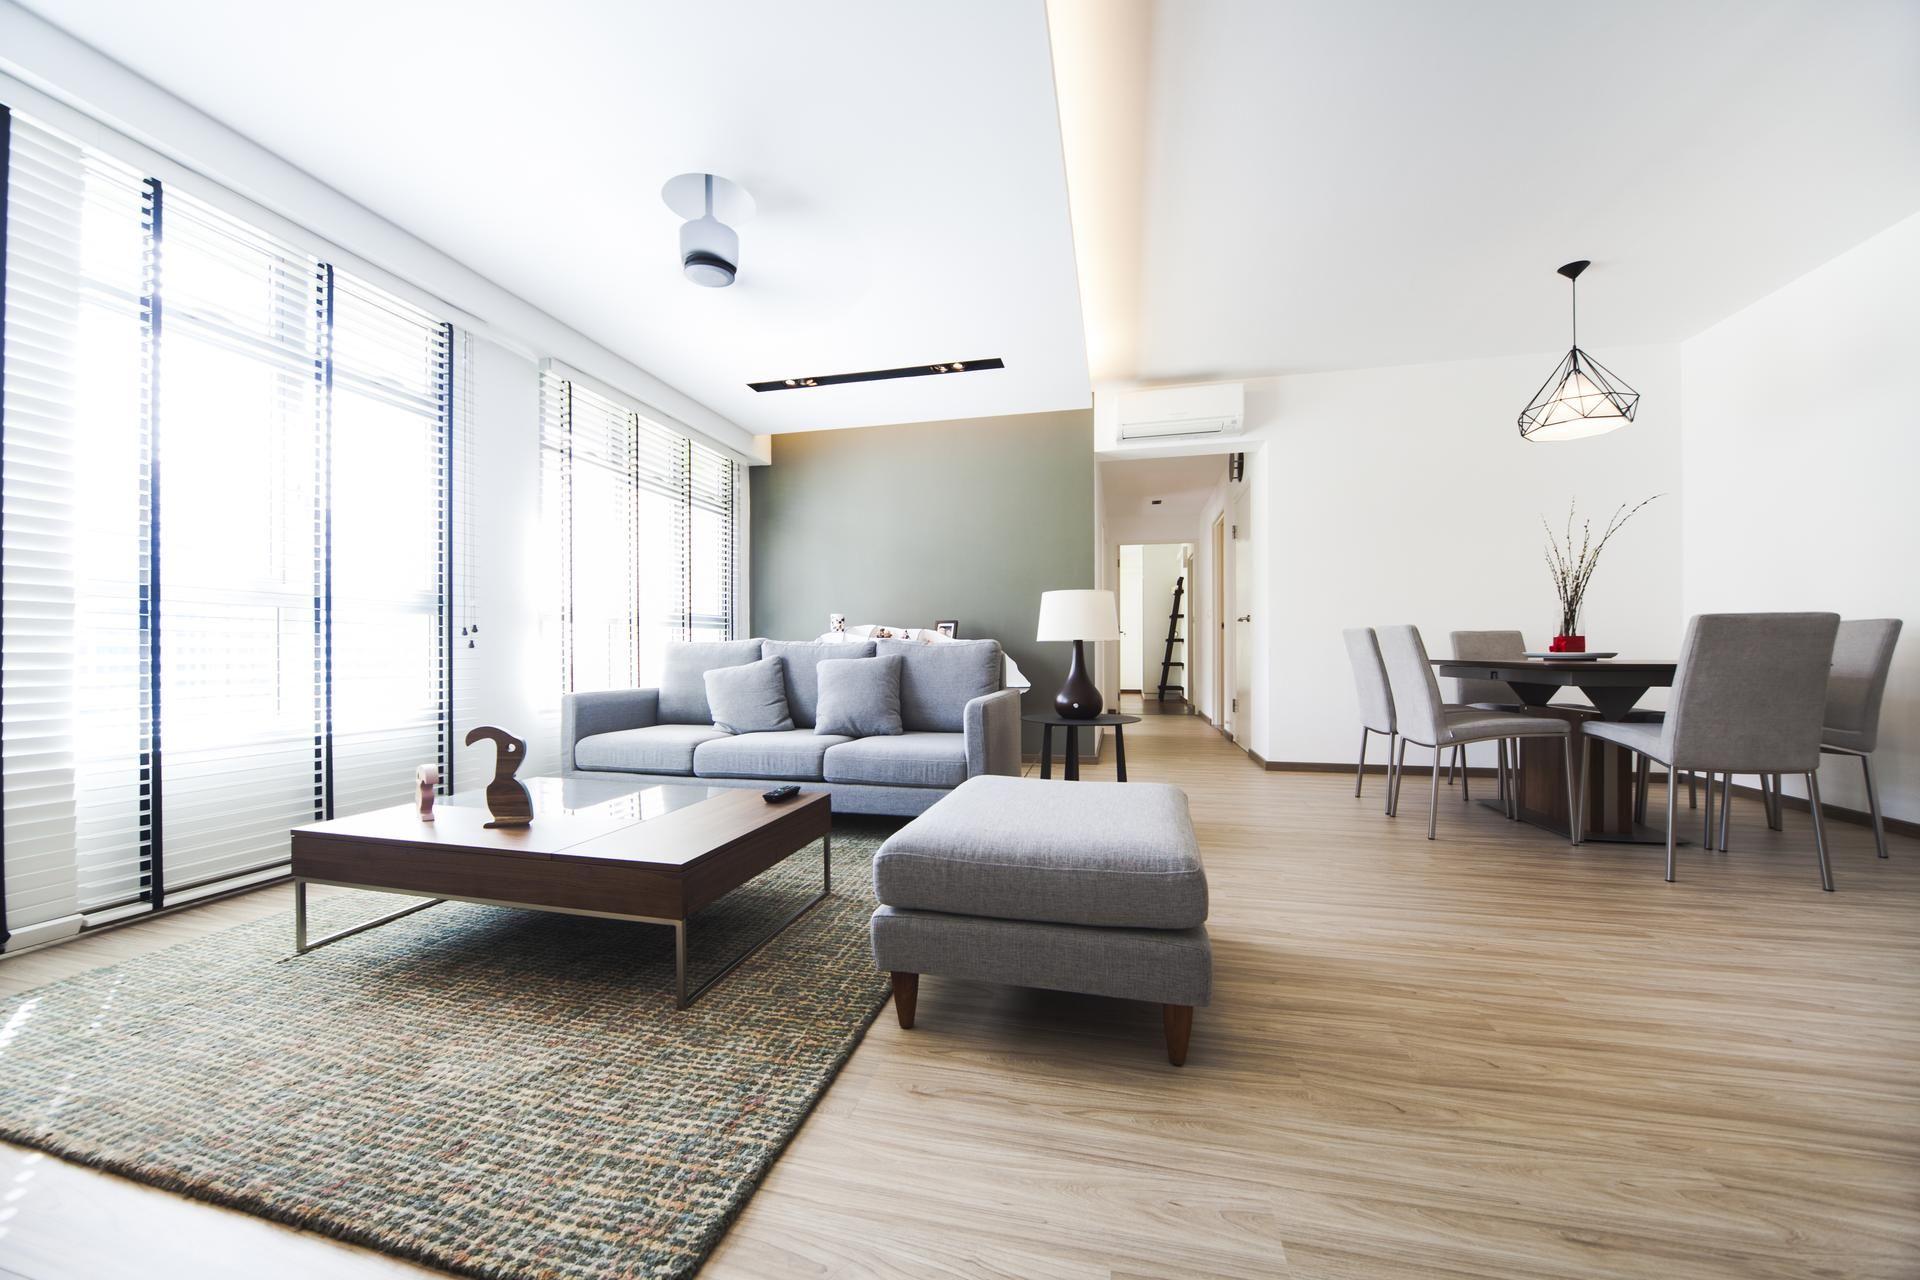 Interior Designers | Professionals | Qanvast | Home Design, Renovation,  Remodelling U0026 Furnishing Ideas | Page 5